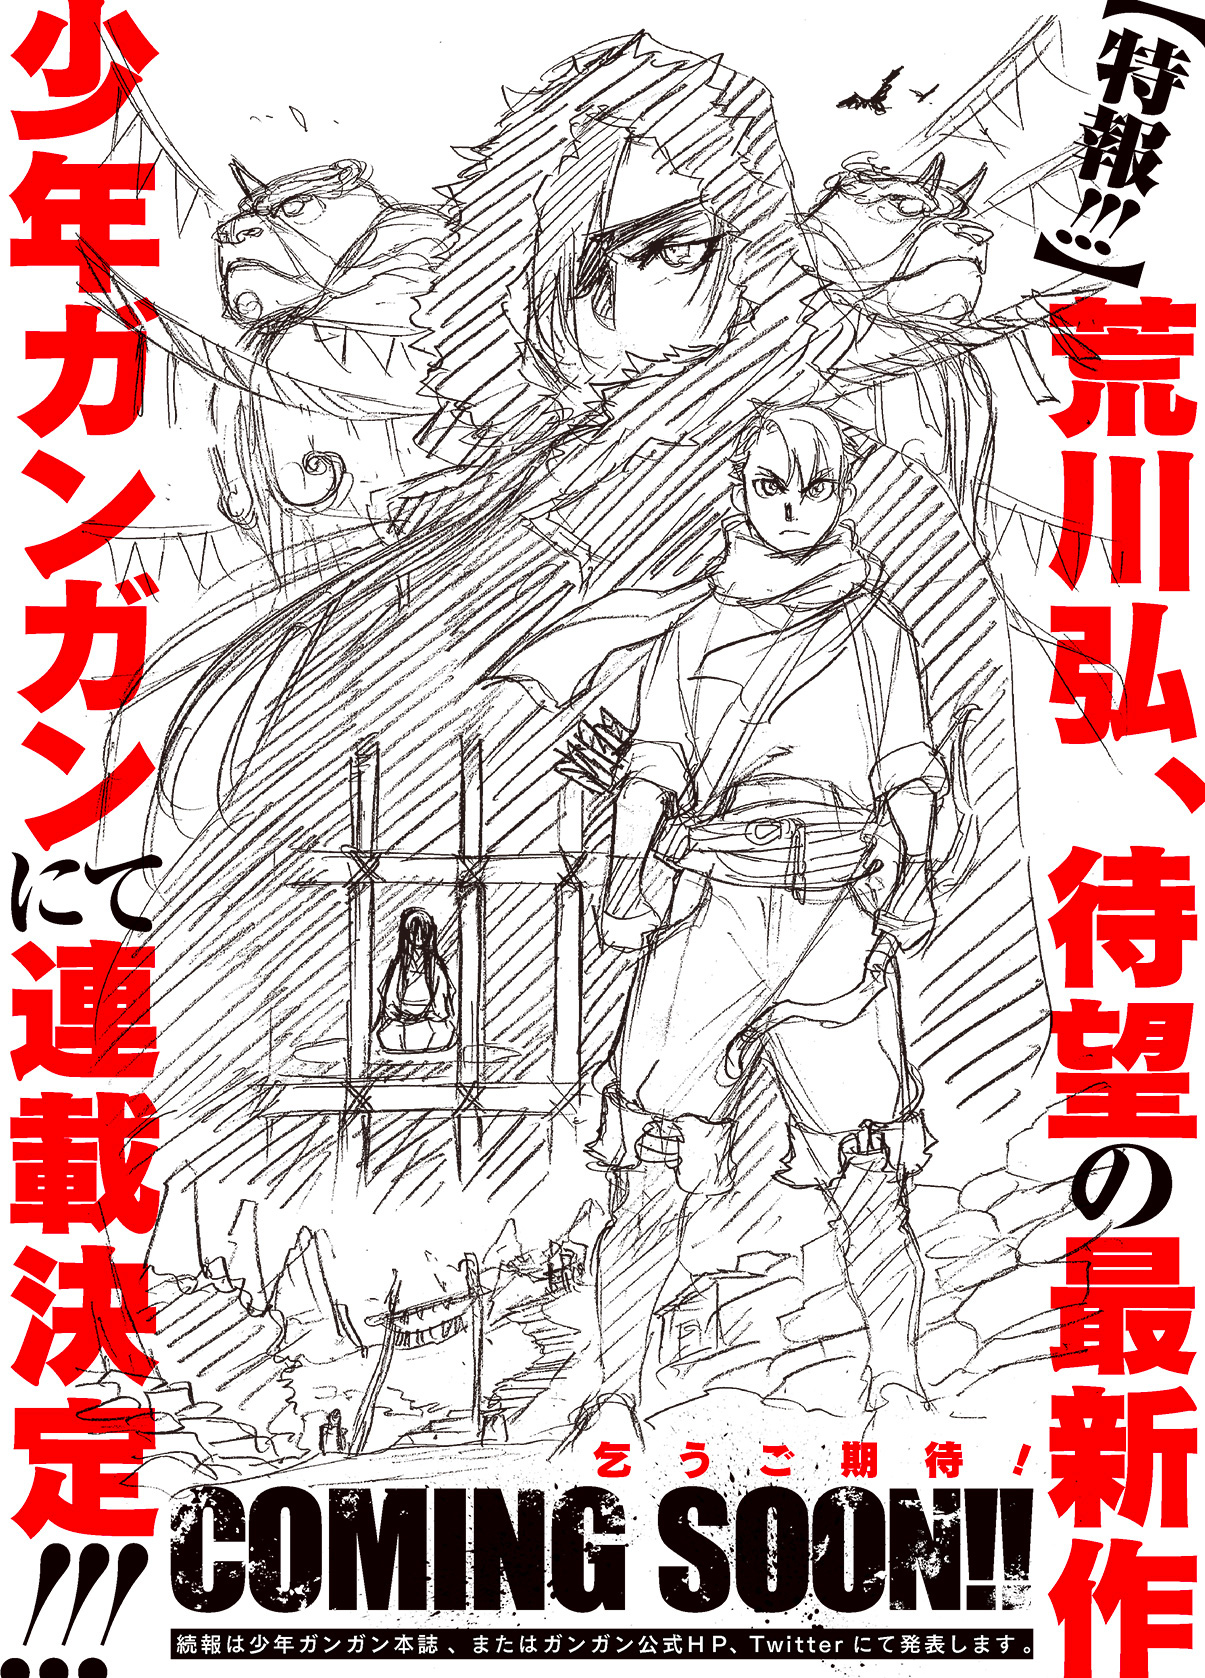 Nuovo manga per Hiromu Arakawa, l'autrice di Fullmetal Alchemist